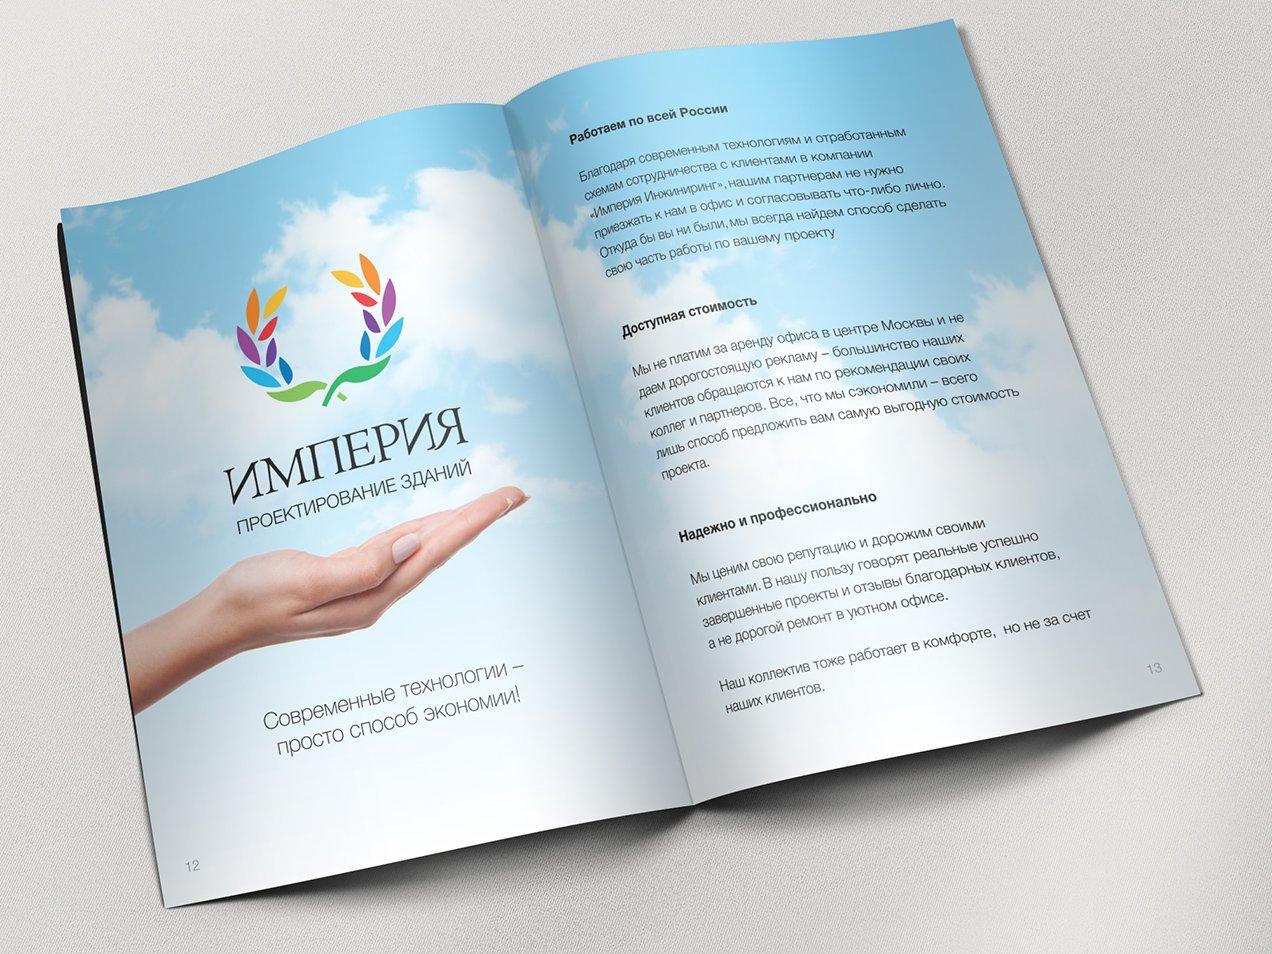 12-13 страницы